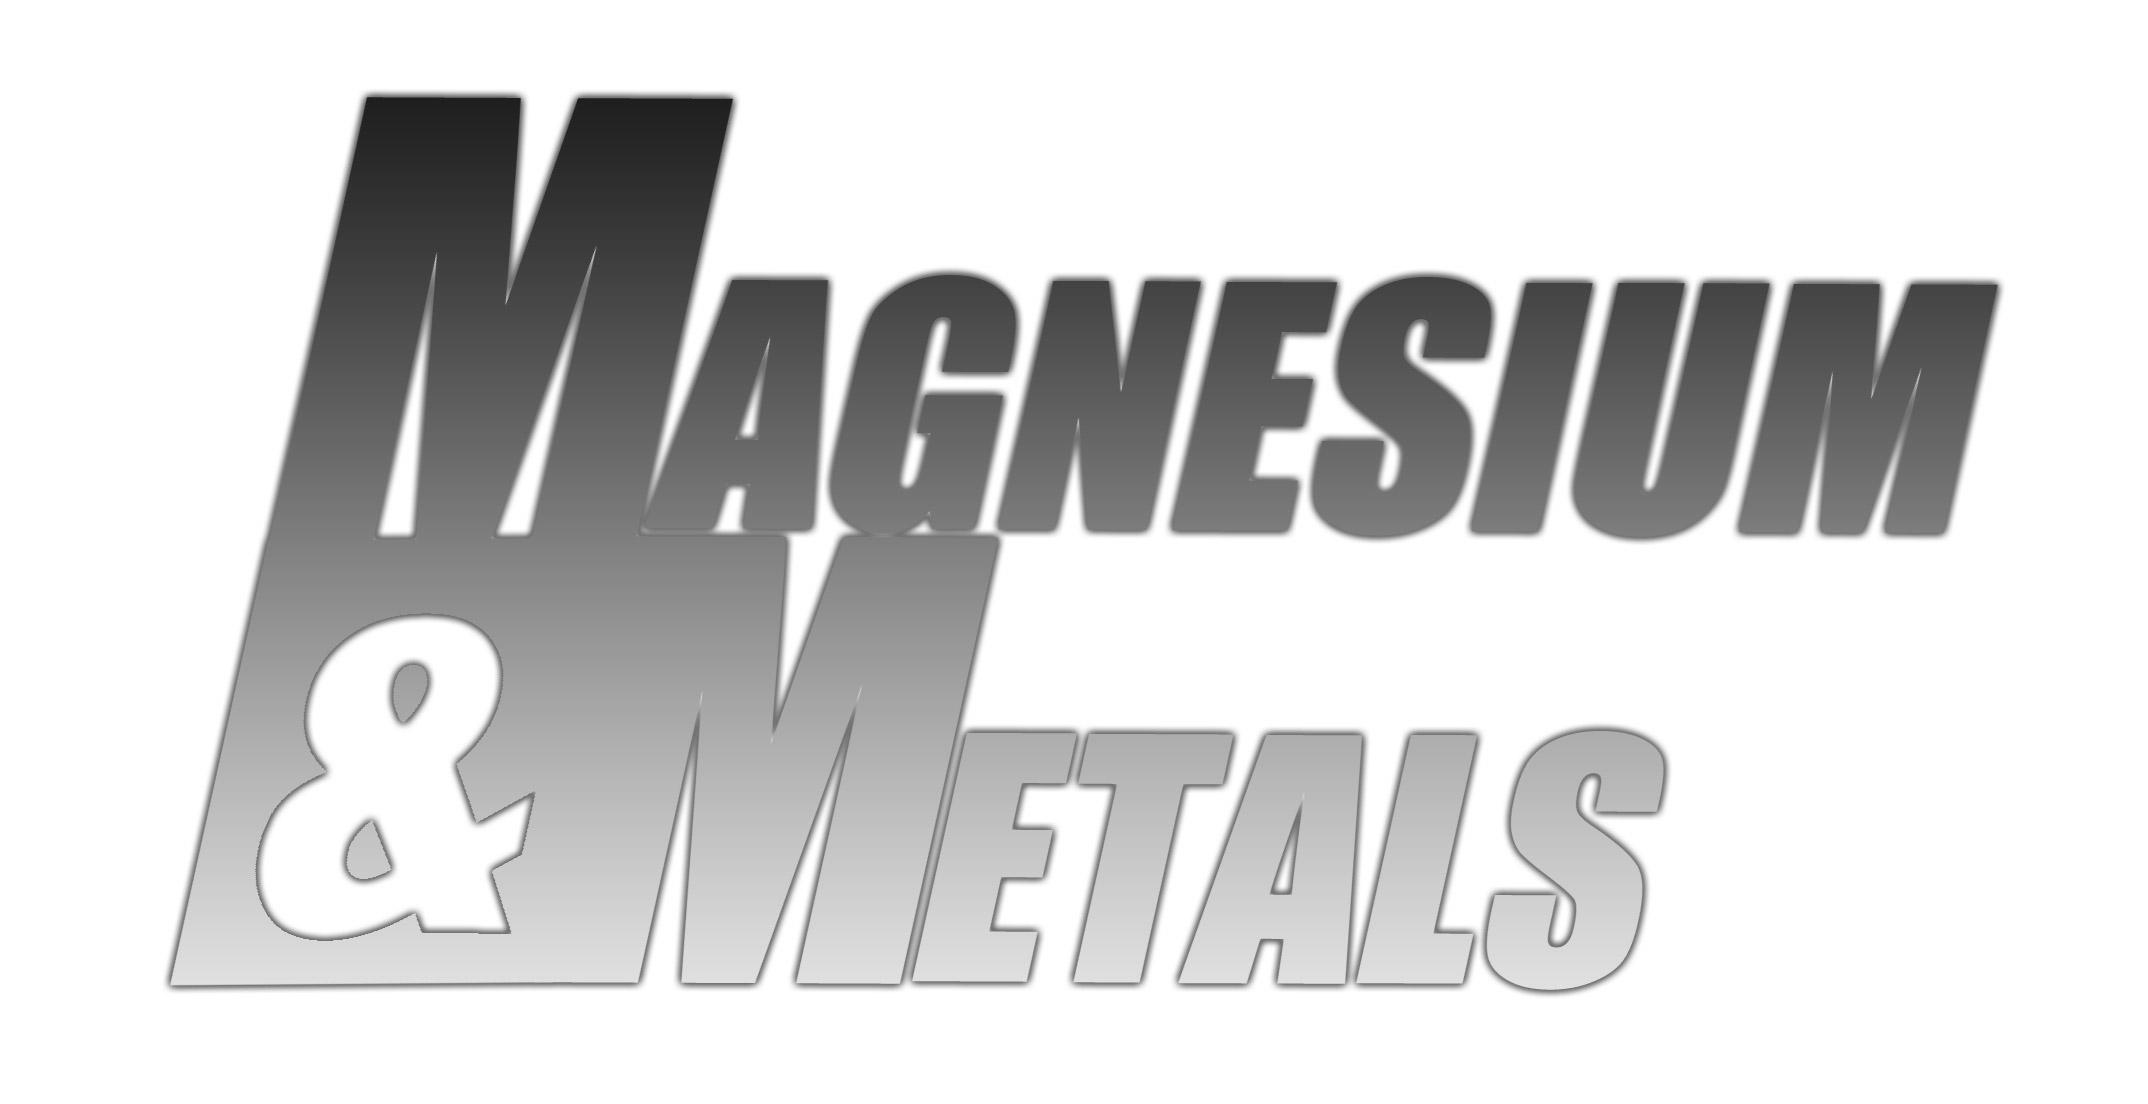 Логотип для проекта Magnesium&Metals фото f_4e7a586e3d494.jpg